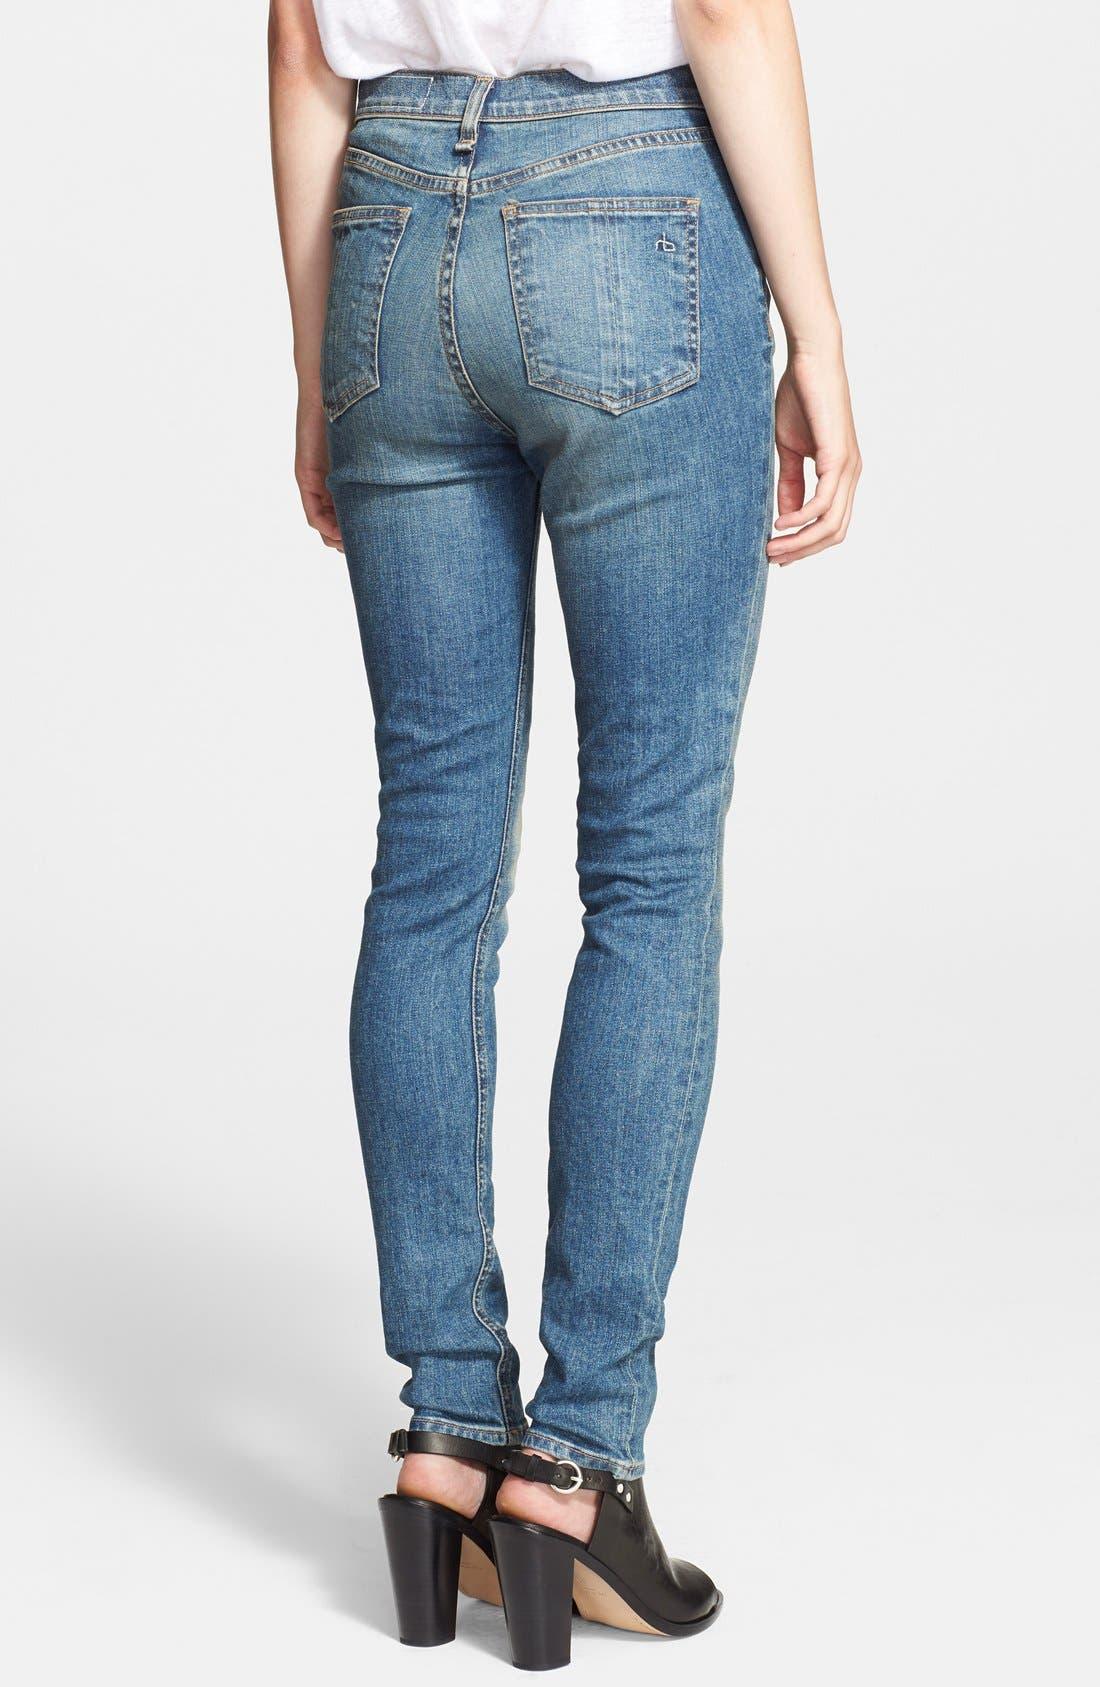 Alternate Image 2  - rag & bone/JEAN 'The Justine' High Rise Jeans (Surf)